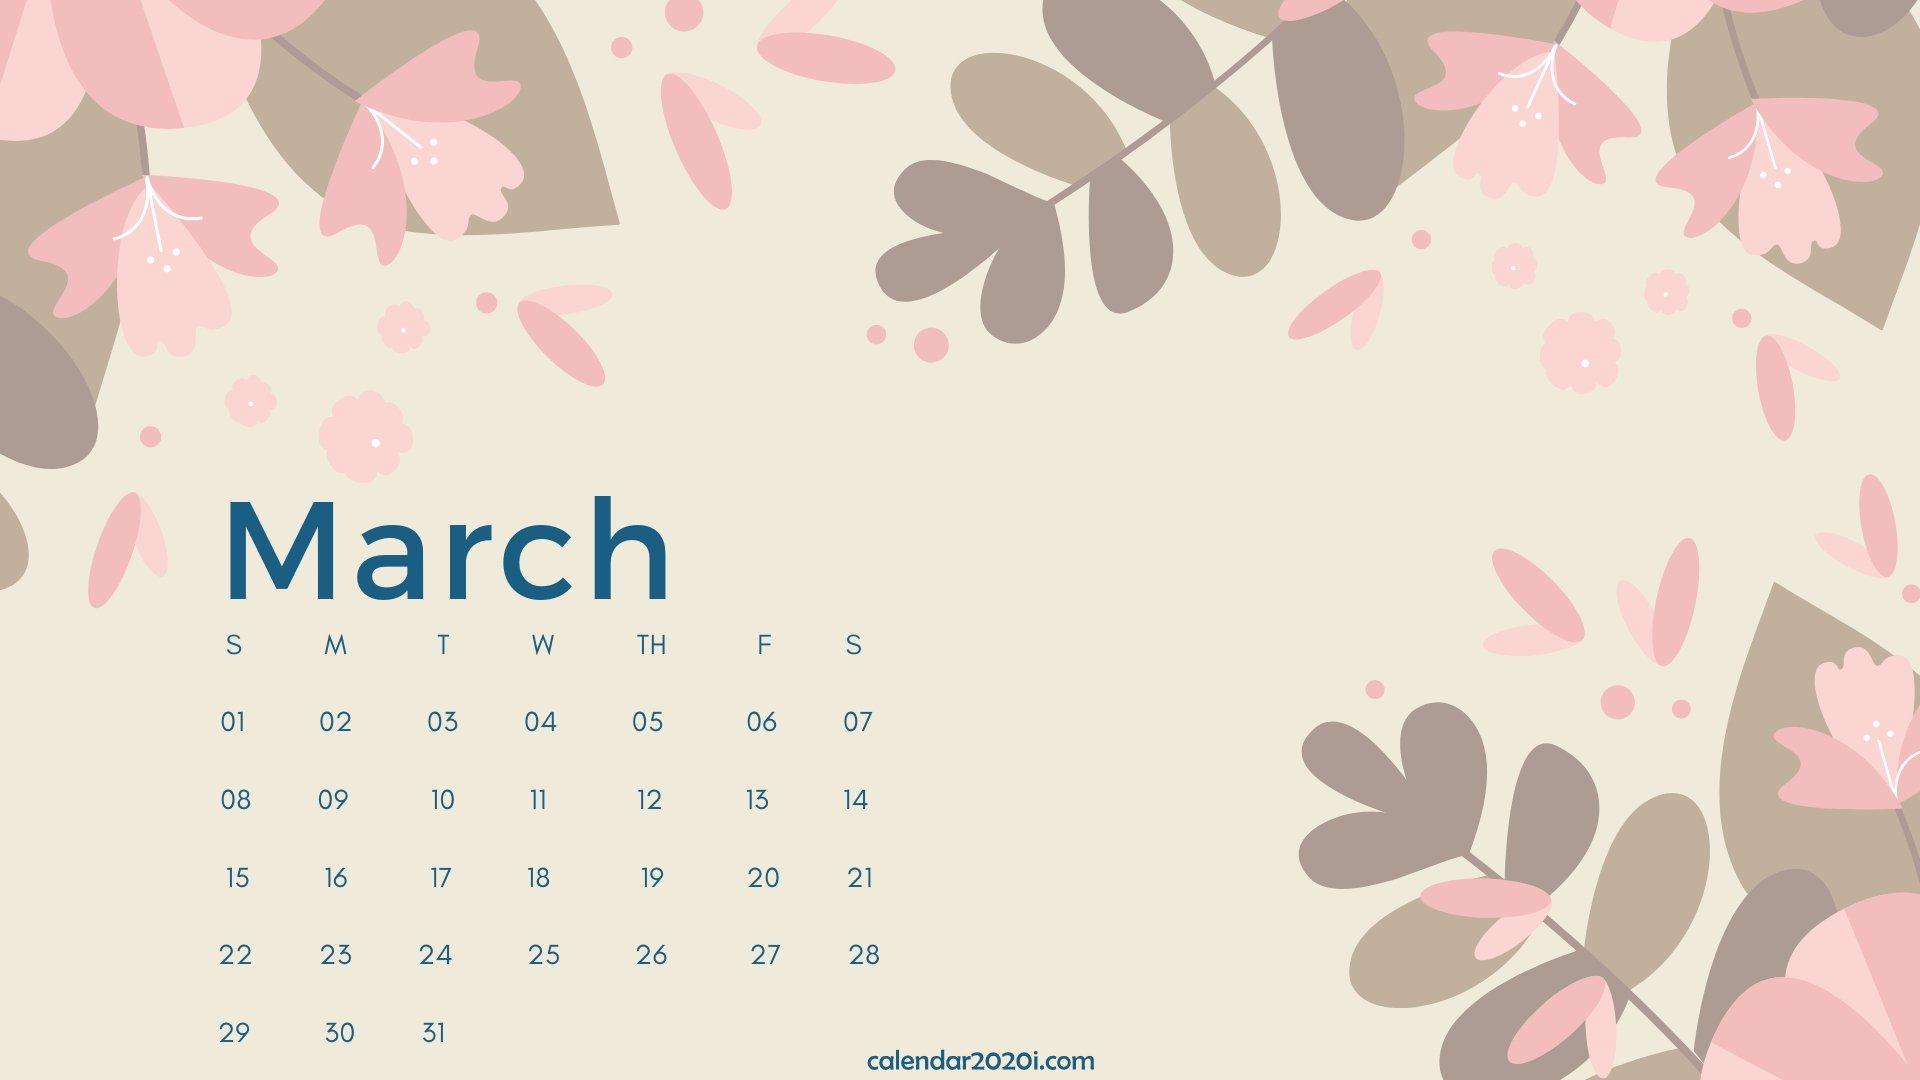 53] Calendar 2020 Wallpapers on WallpaperSafari 1920x1080